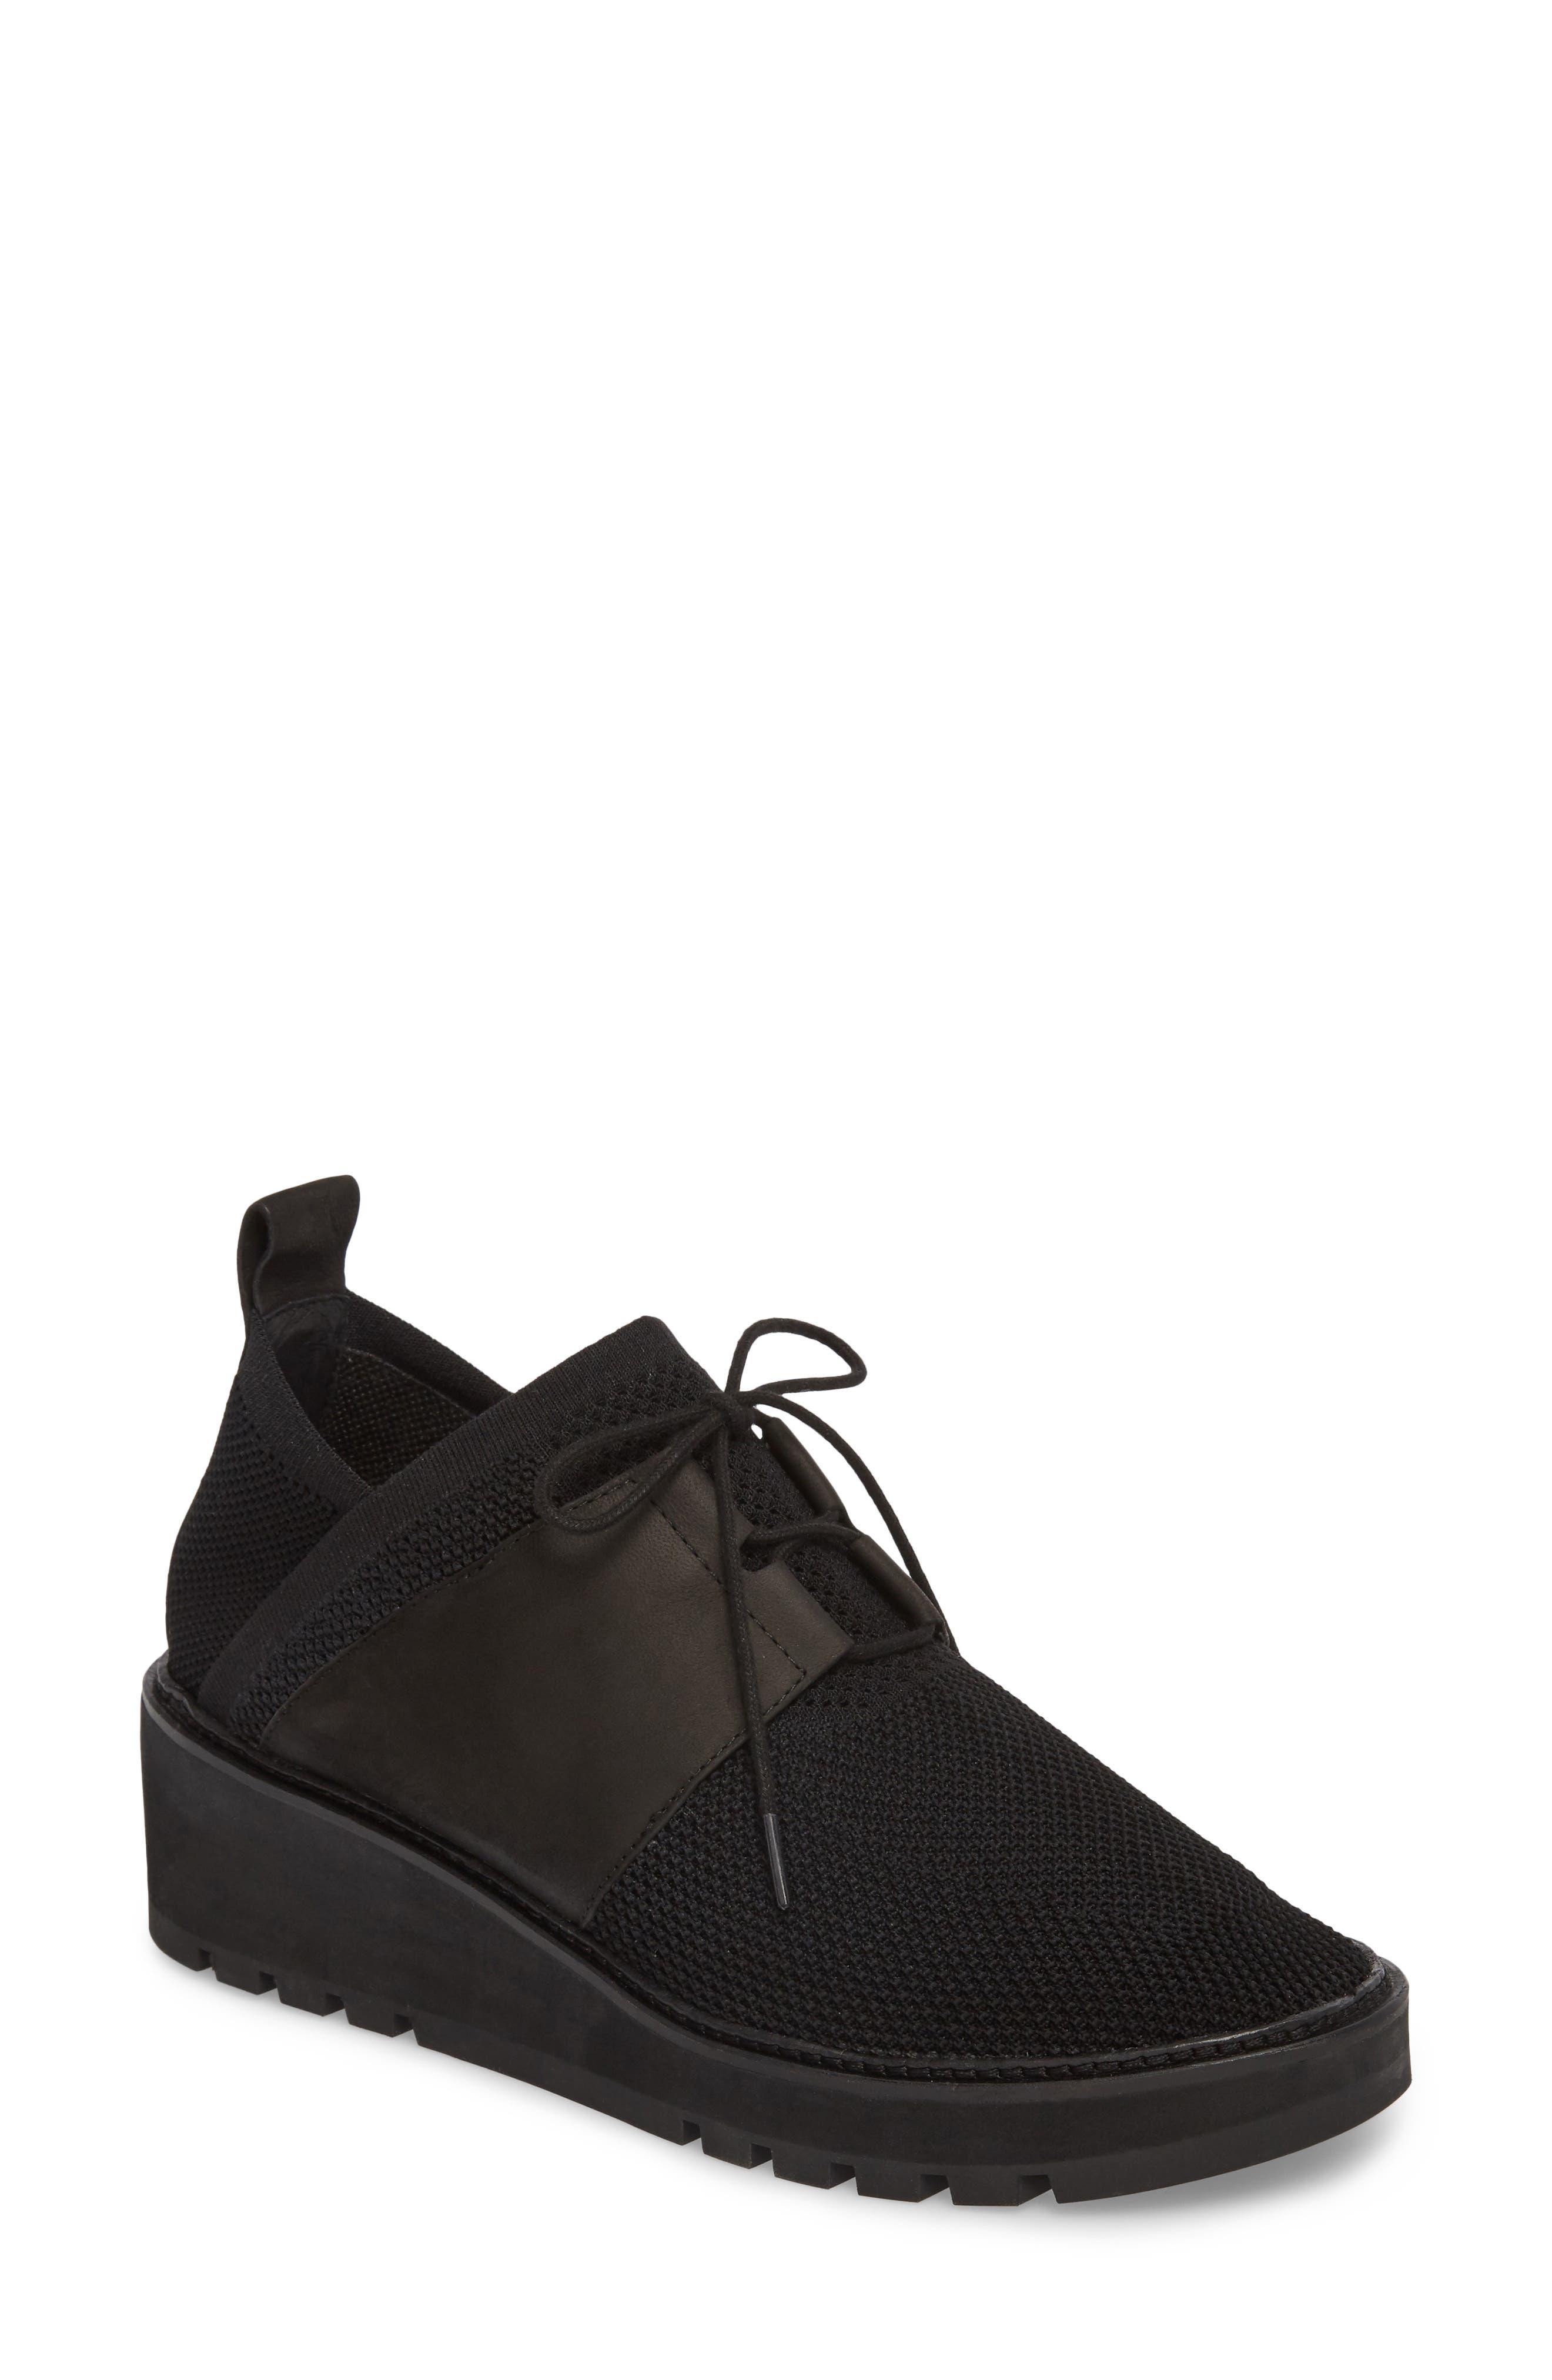 Wilson Sneaker,                             Main thumbnail 1, color,                             Black Fabric